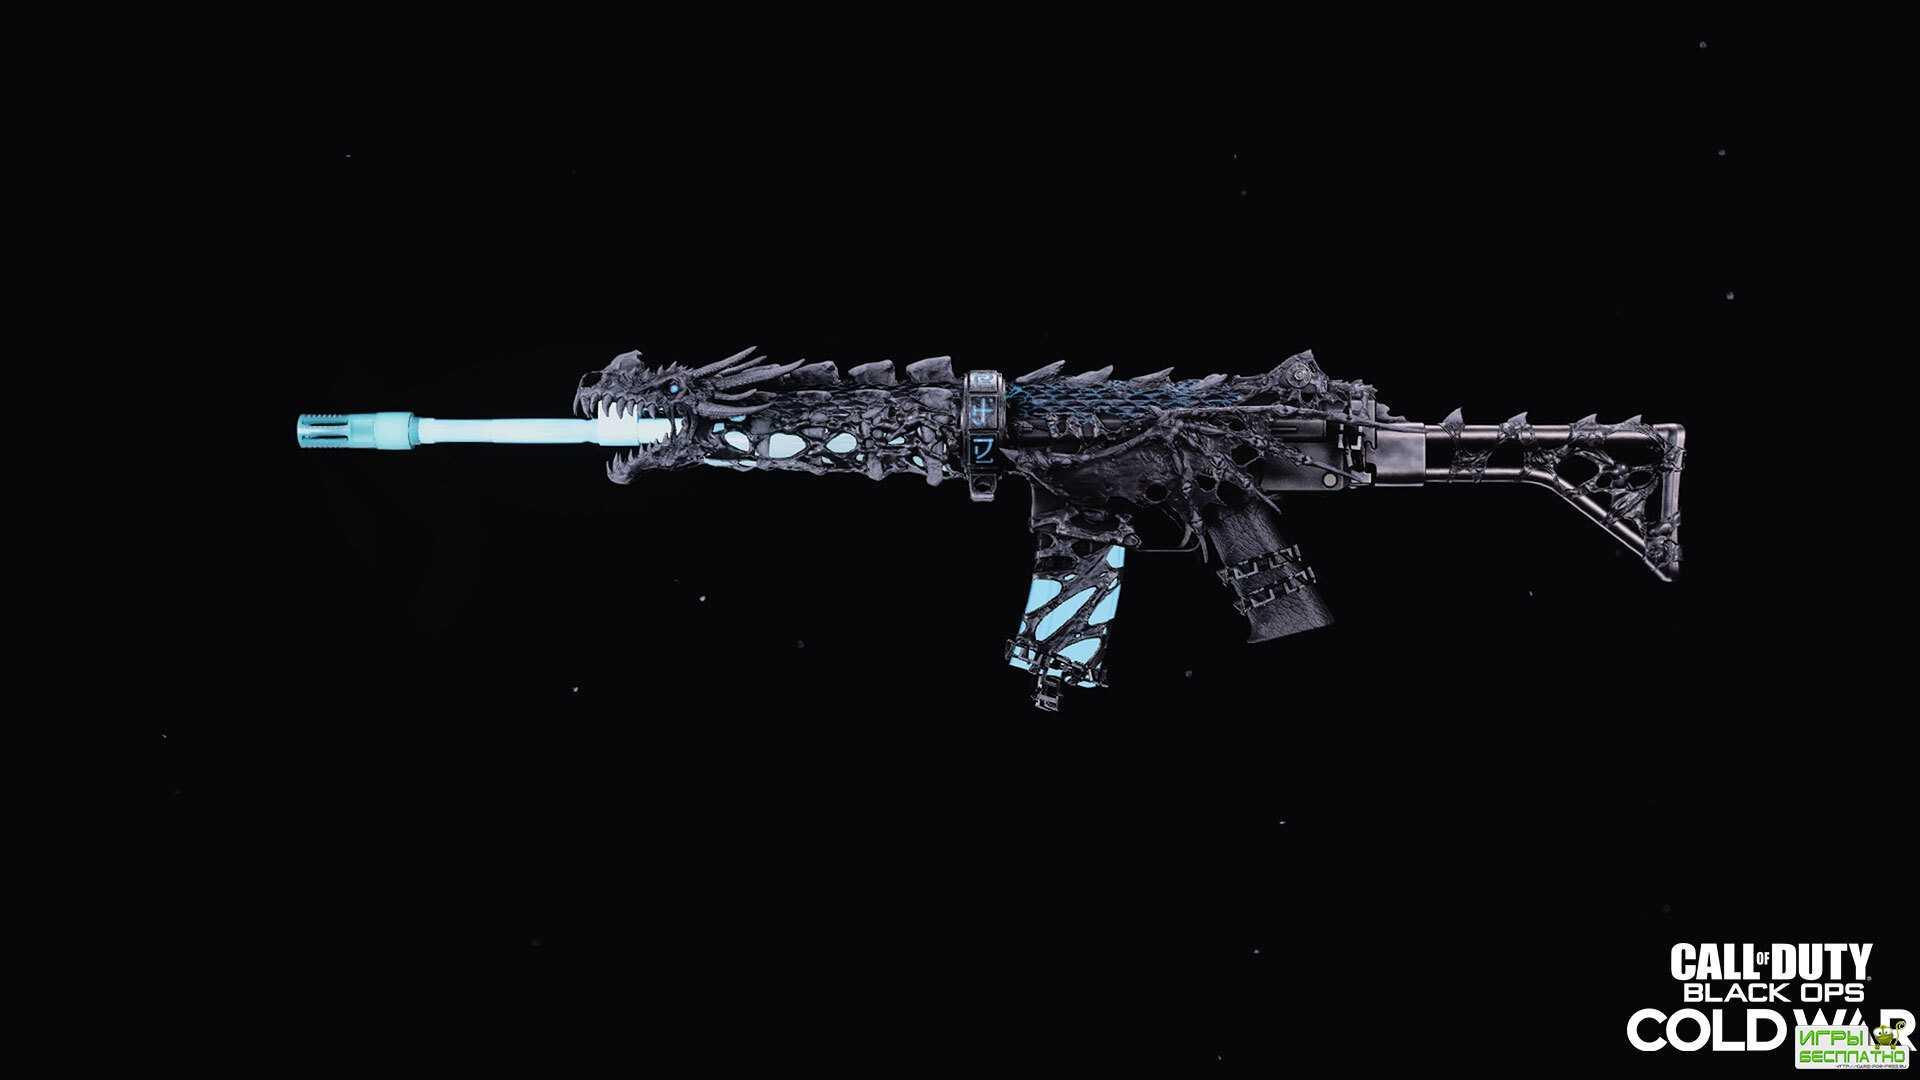 В Call of Duty добавили скин в виде дракона